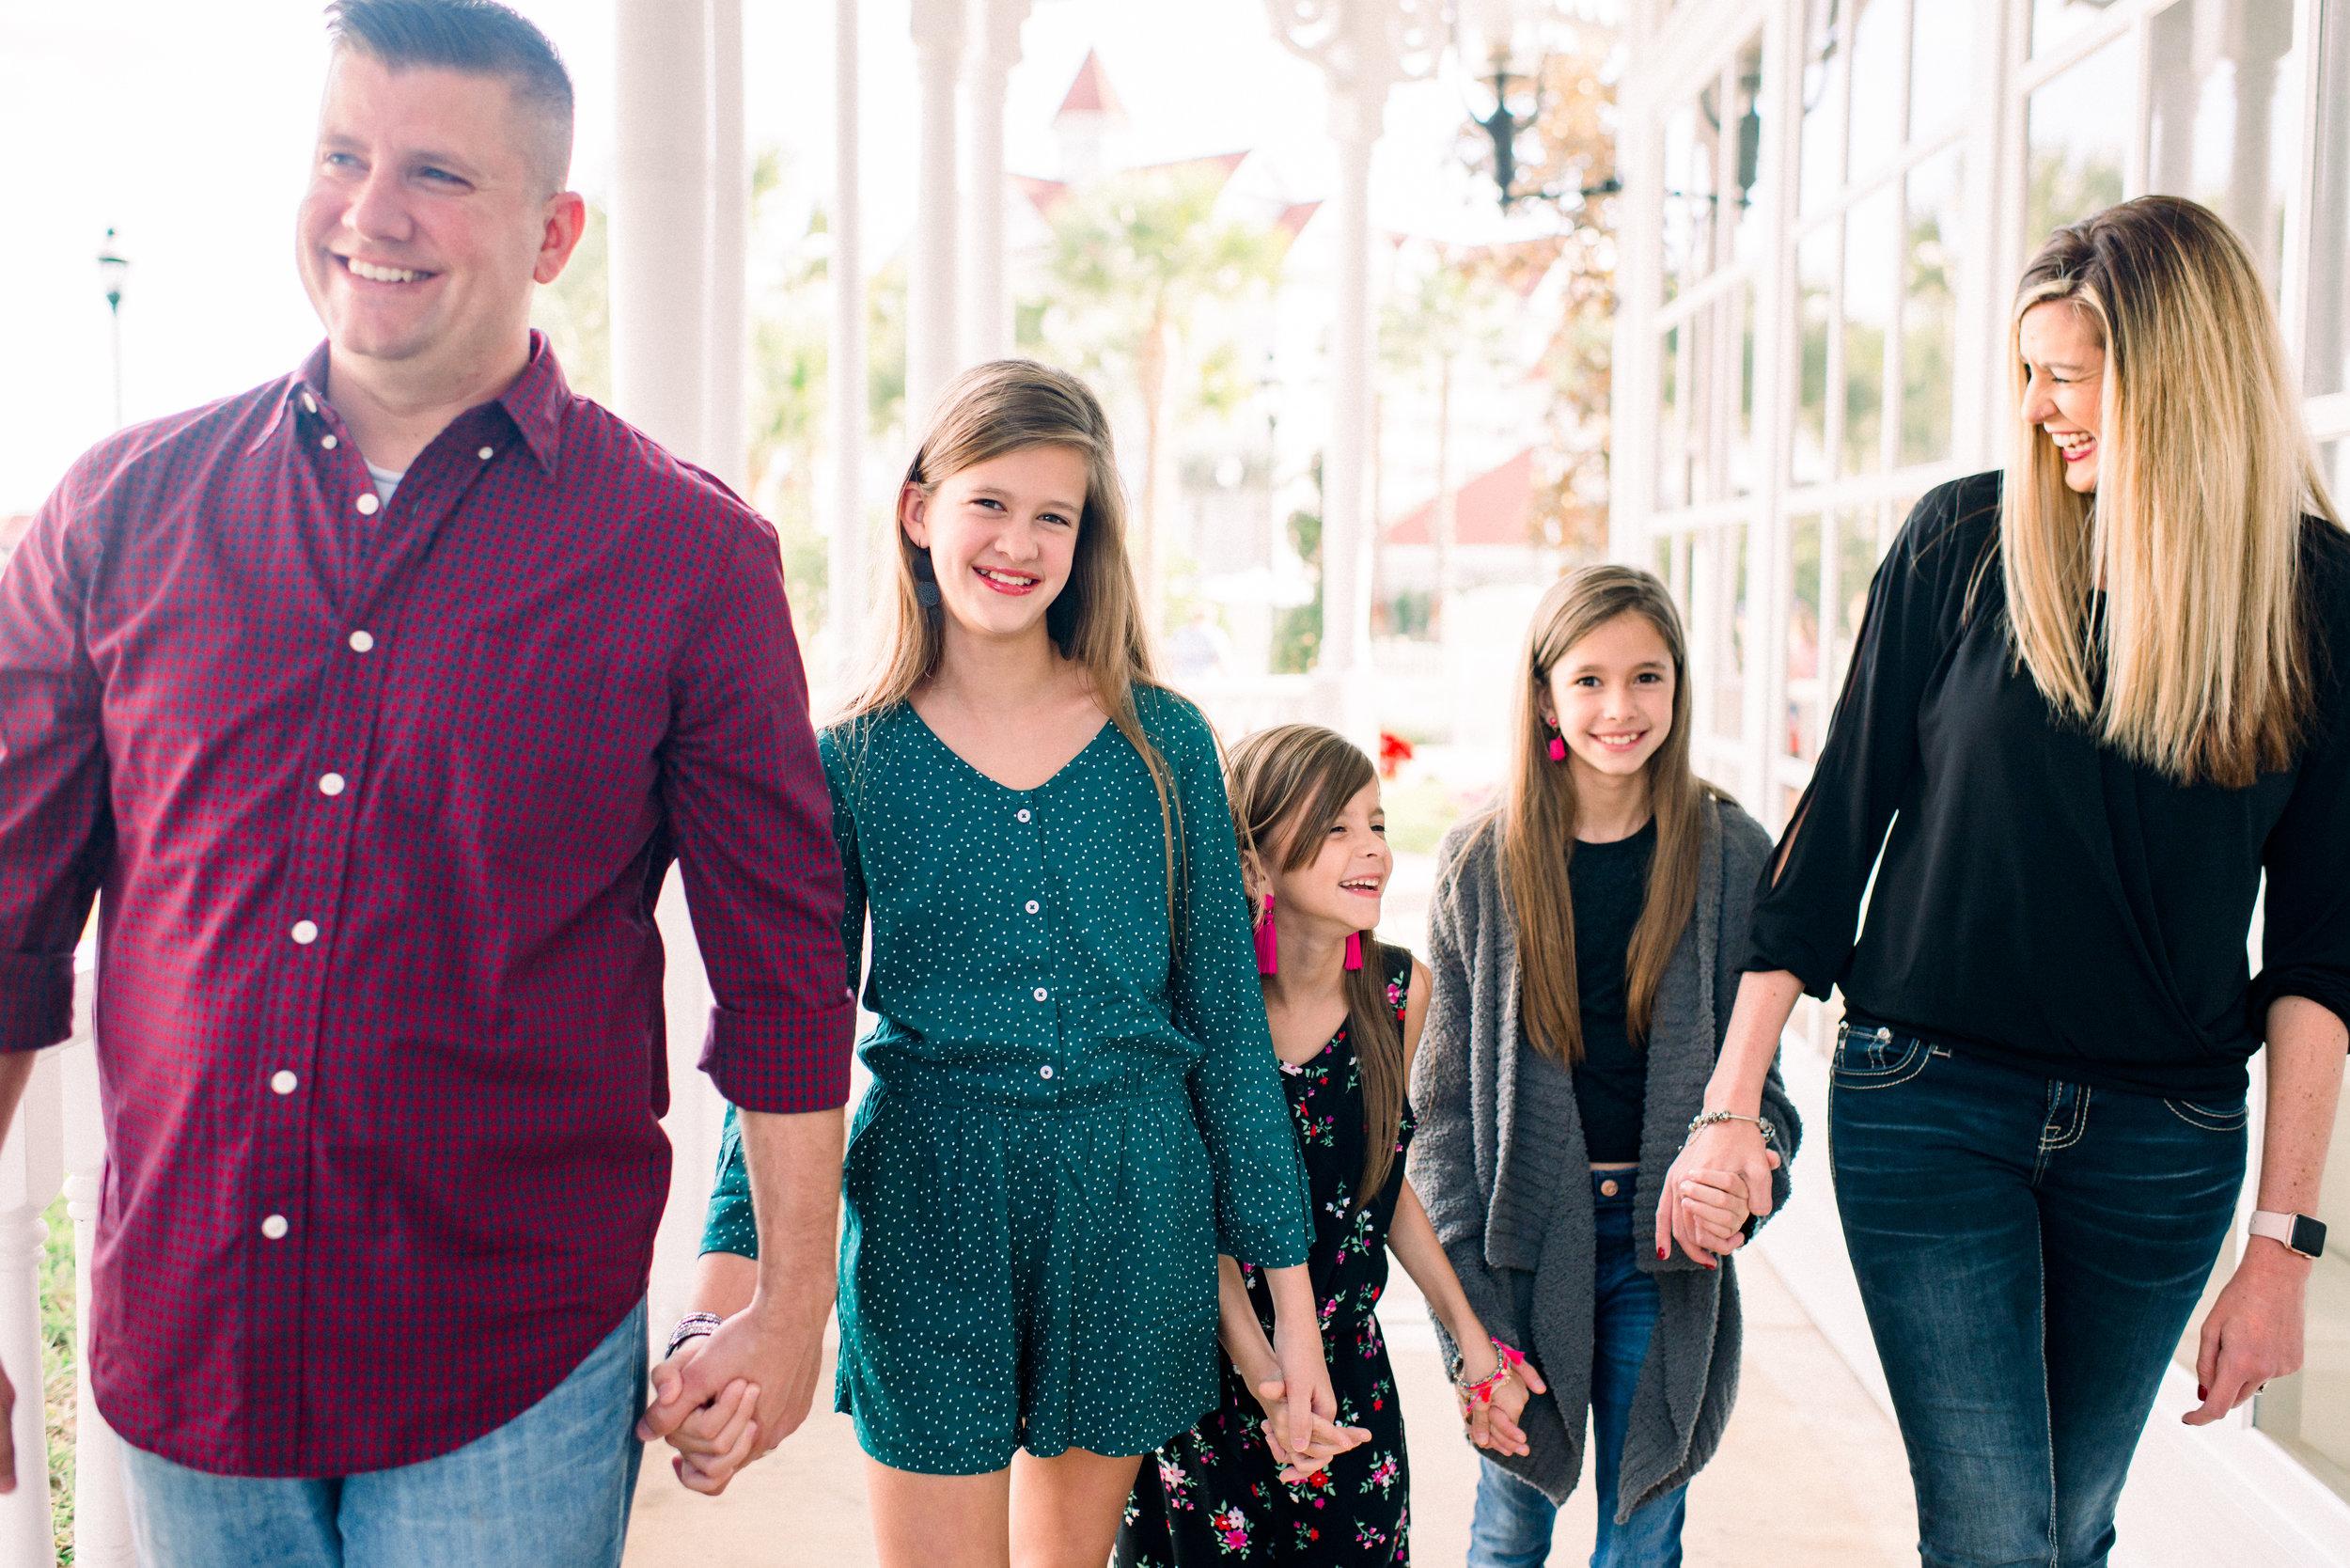 KateTaramykinStudios-Disney-Grand-Floridian-Family-Portraits-Kulwicki-1.jpg